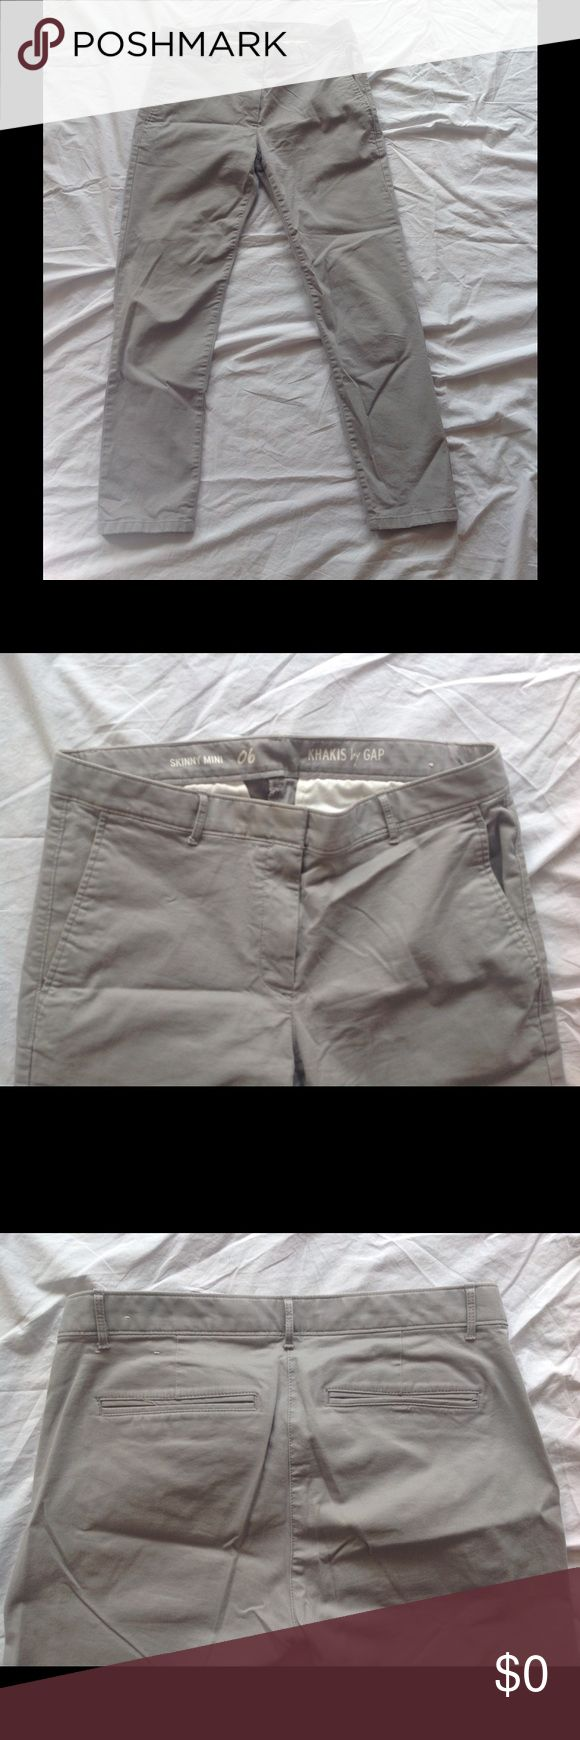 NWOT GAP Skinny Mini Kakis Size 6, pewter gray, cotton with 3% elastane.  Year round weight. GAP Pants Straight Leg